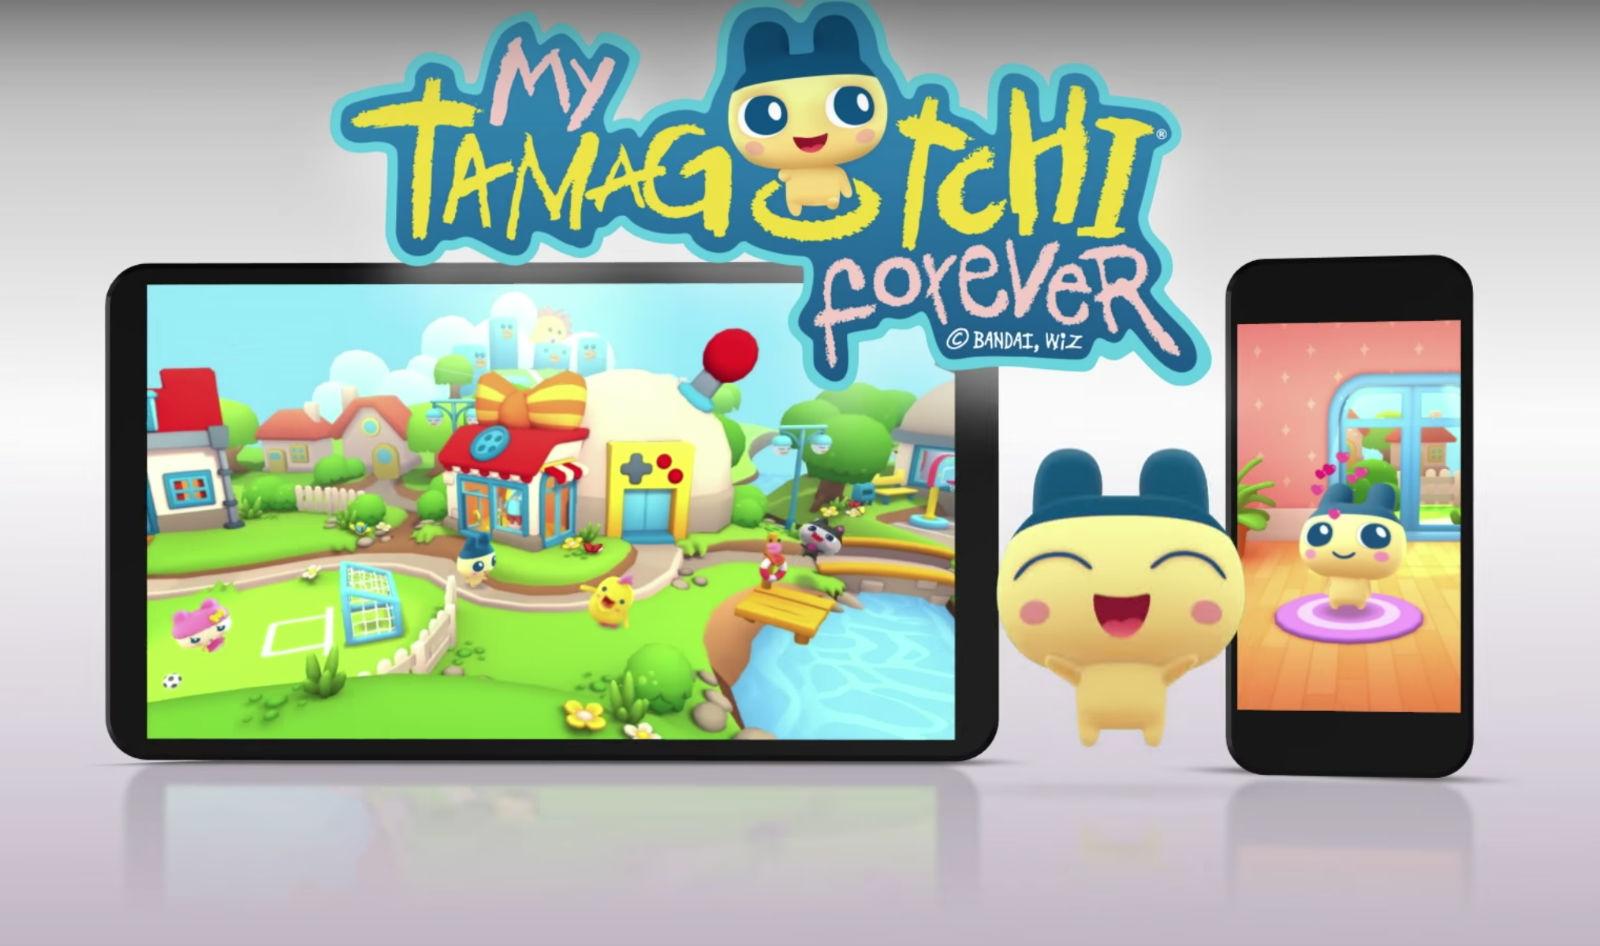 Kangen Pelihara Tamagotchi? Sekarang sudah ada di Android dan iOS Loh!